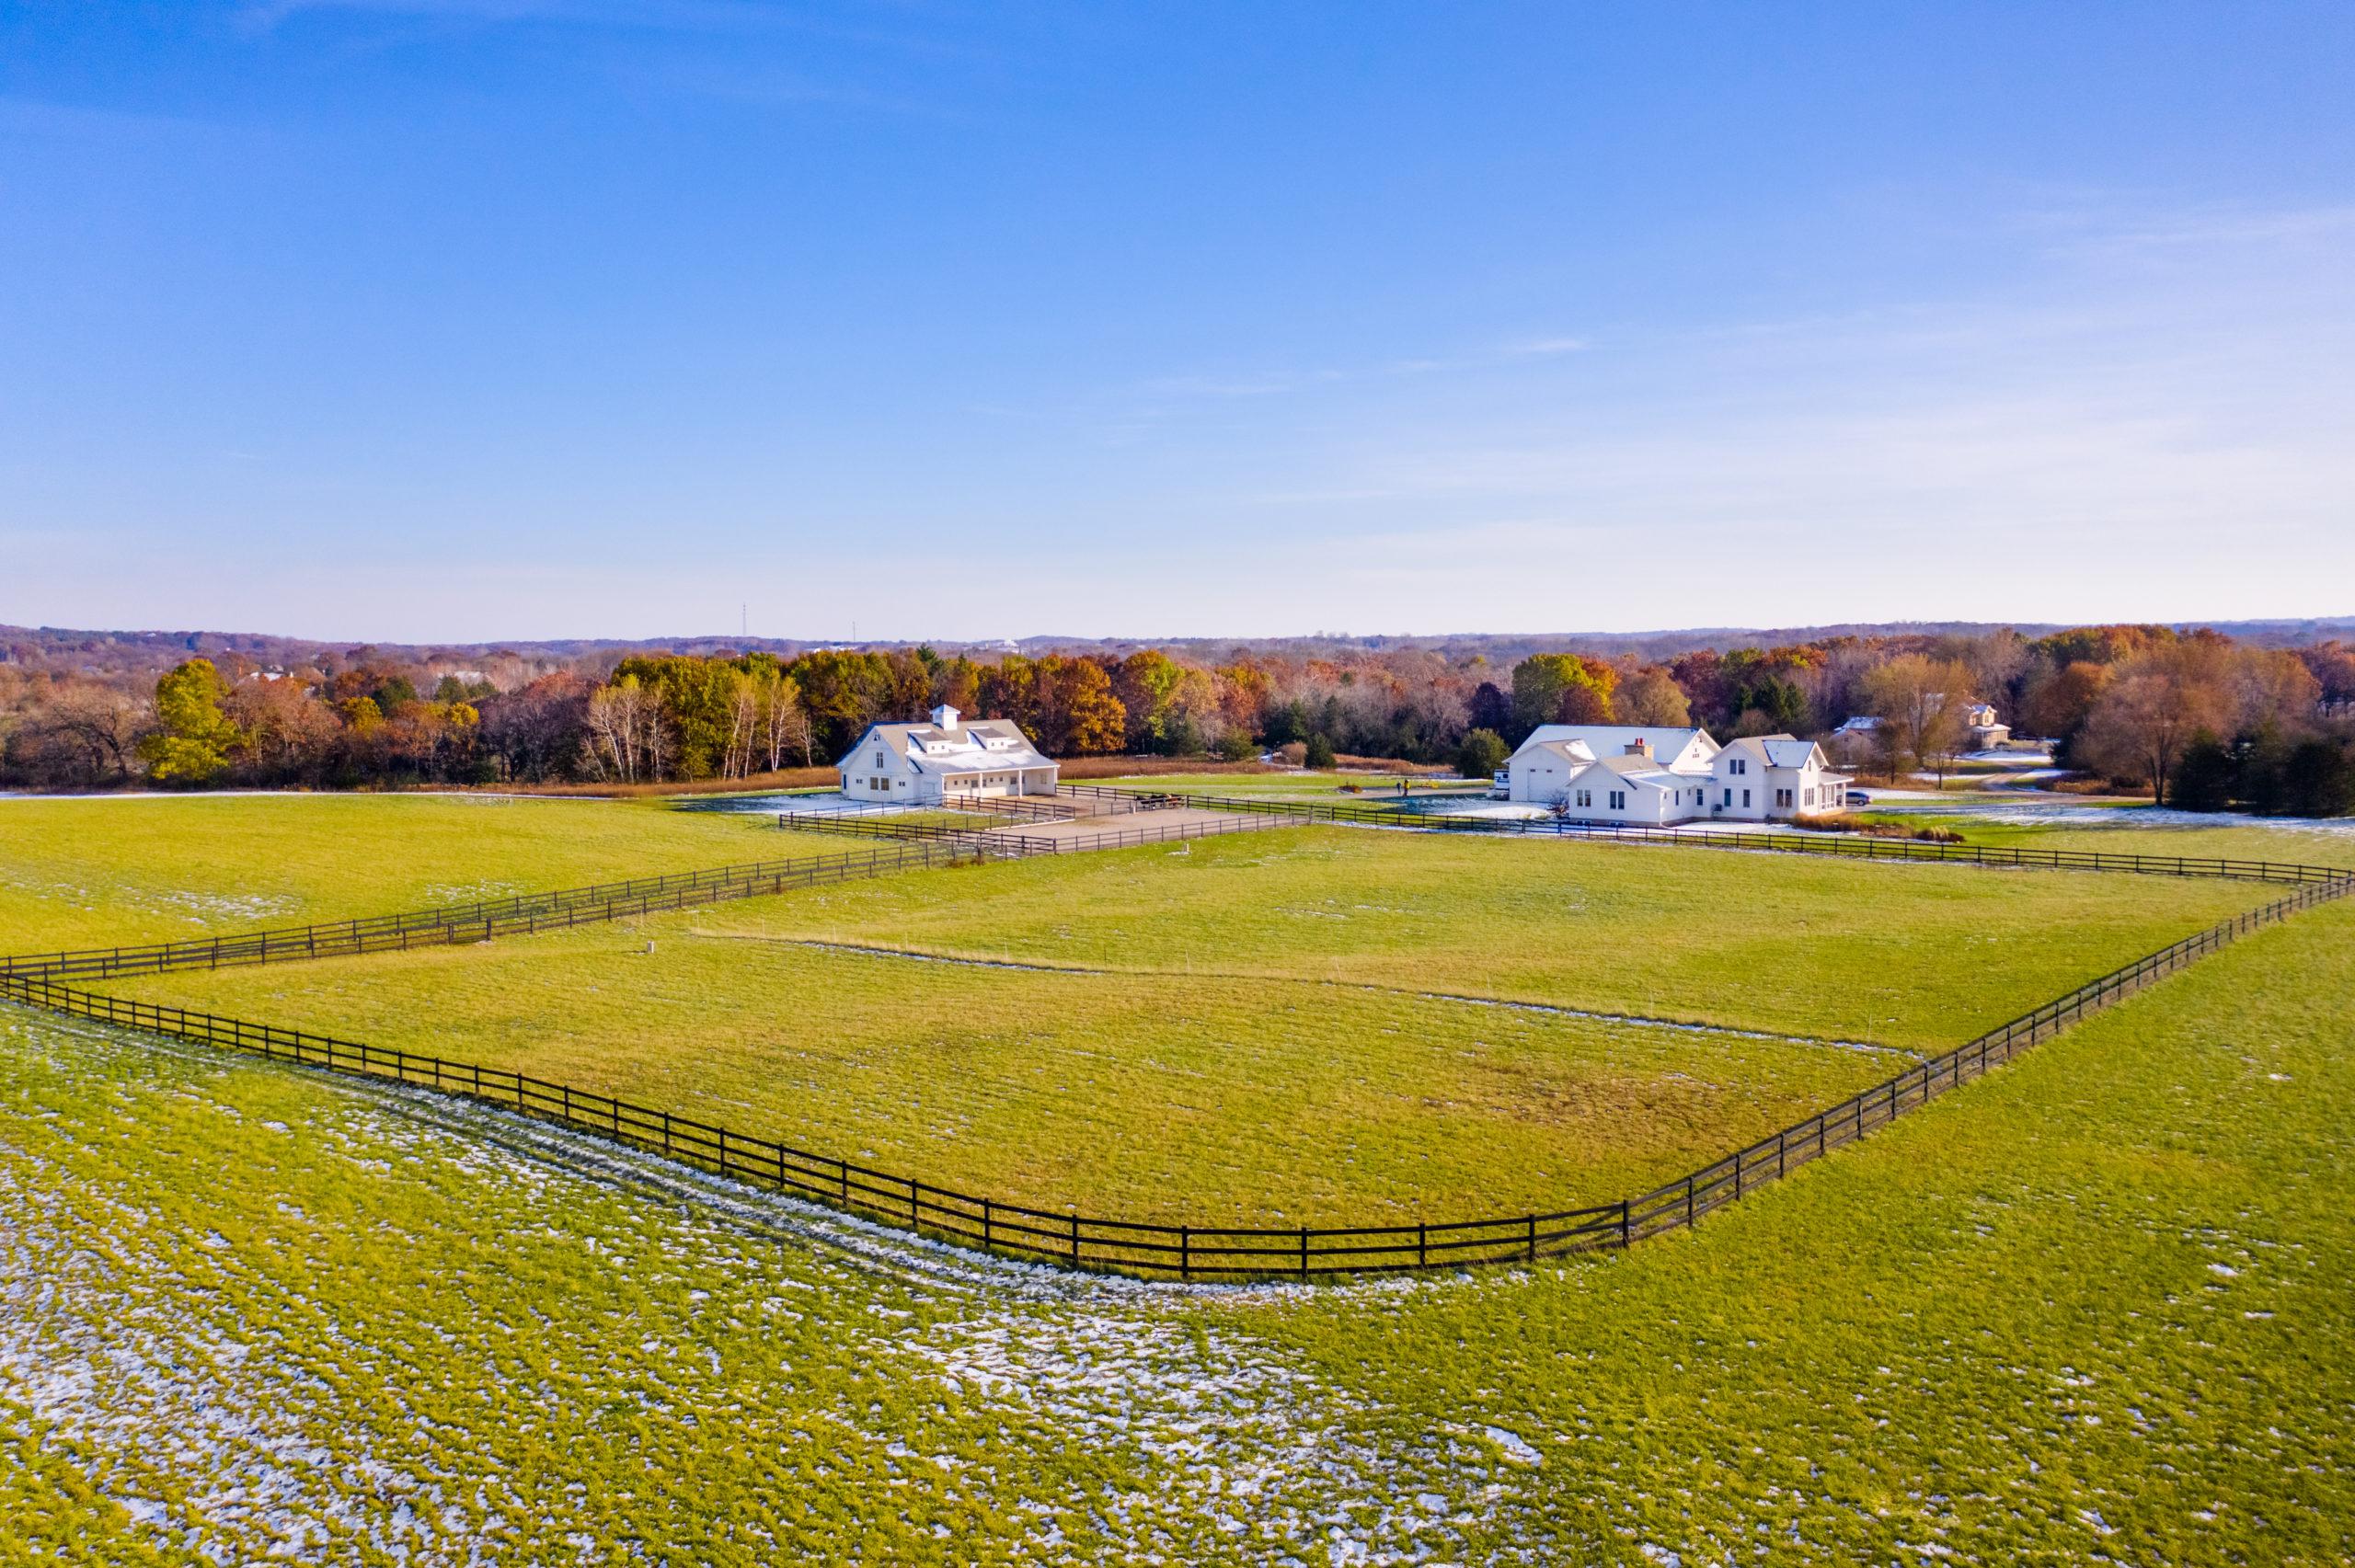 Snow-Sprinkled Horse Ranch